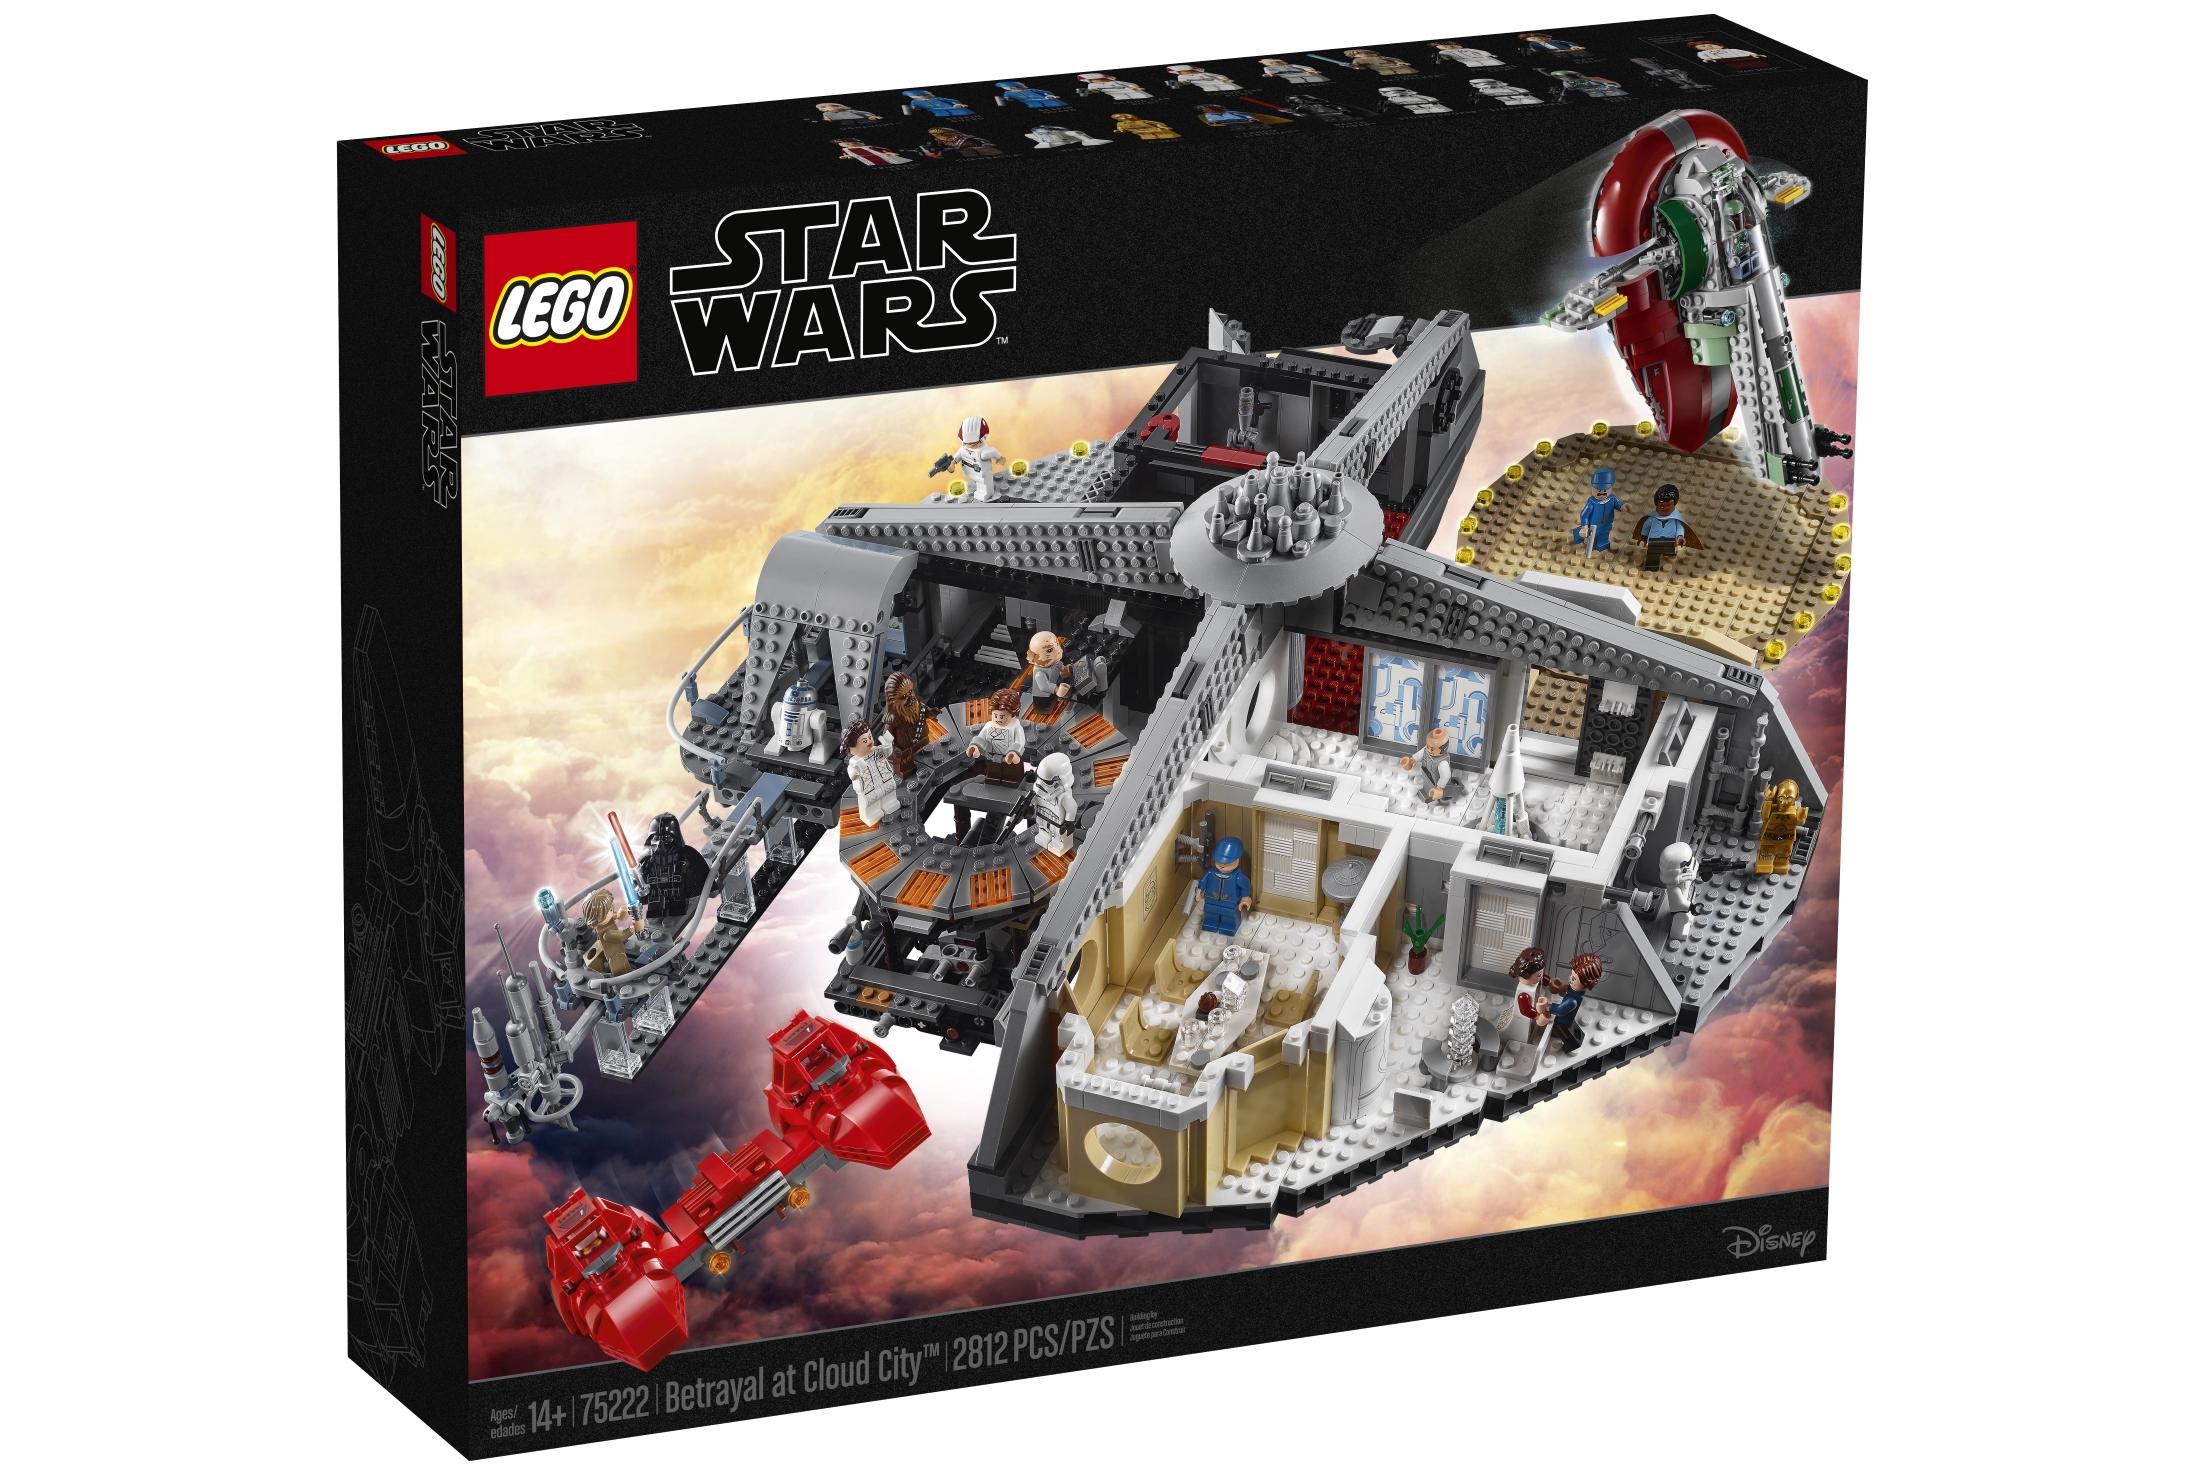 Lego Star Wars Betrayal at Cloud City set is impressive… most impressive